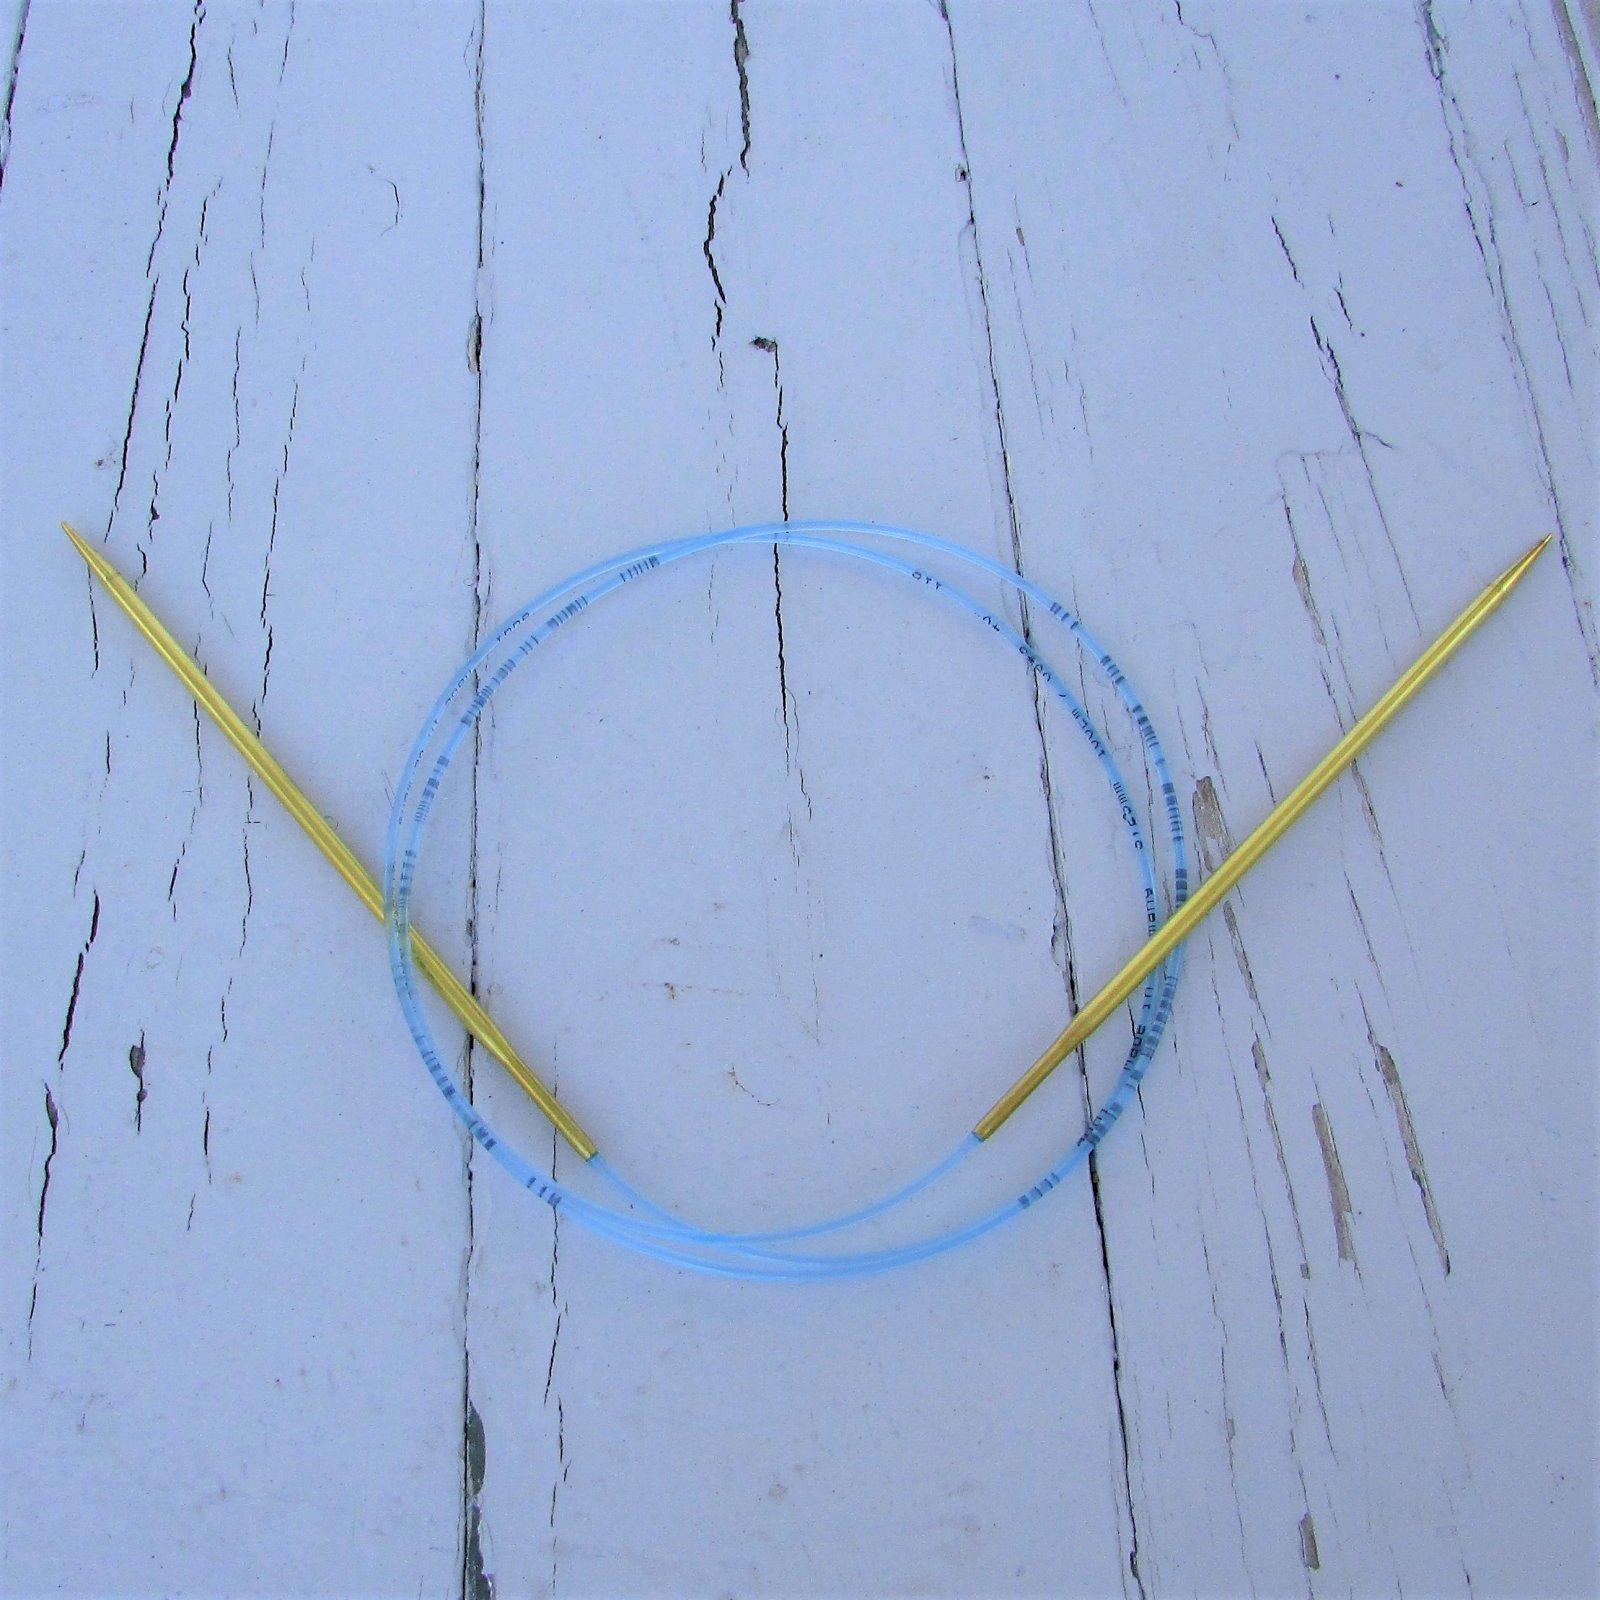 Addi Lace 40 Circular Needles